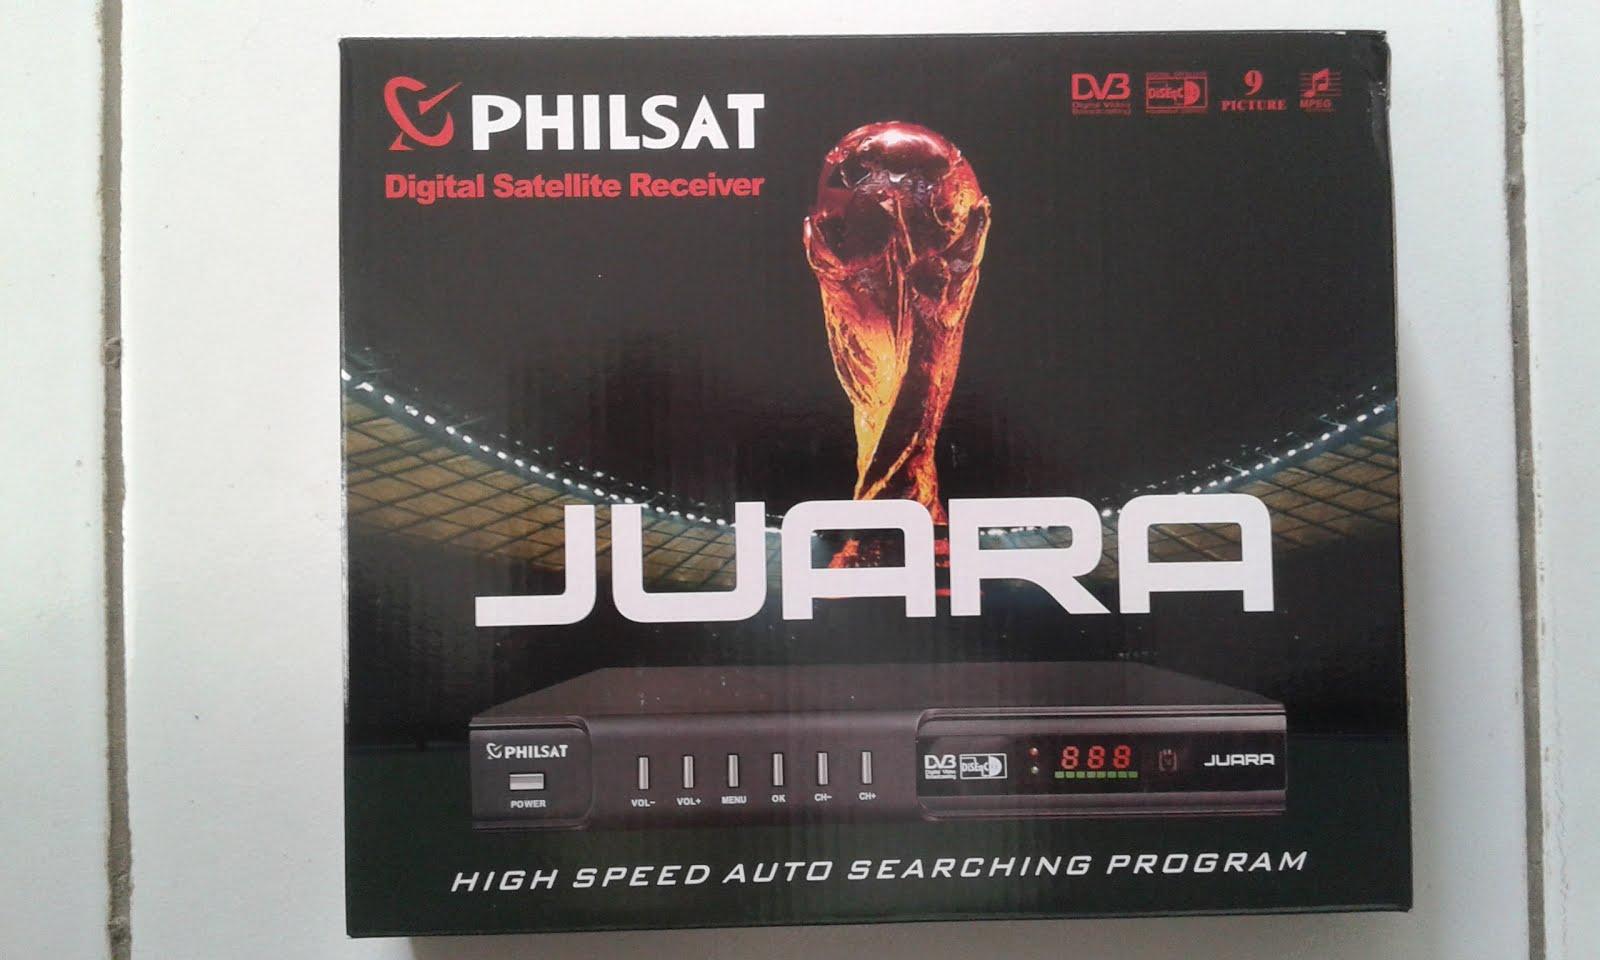 PHILSAT JUARA MPEG2